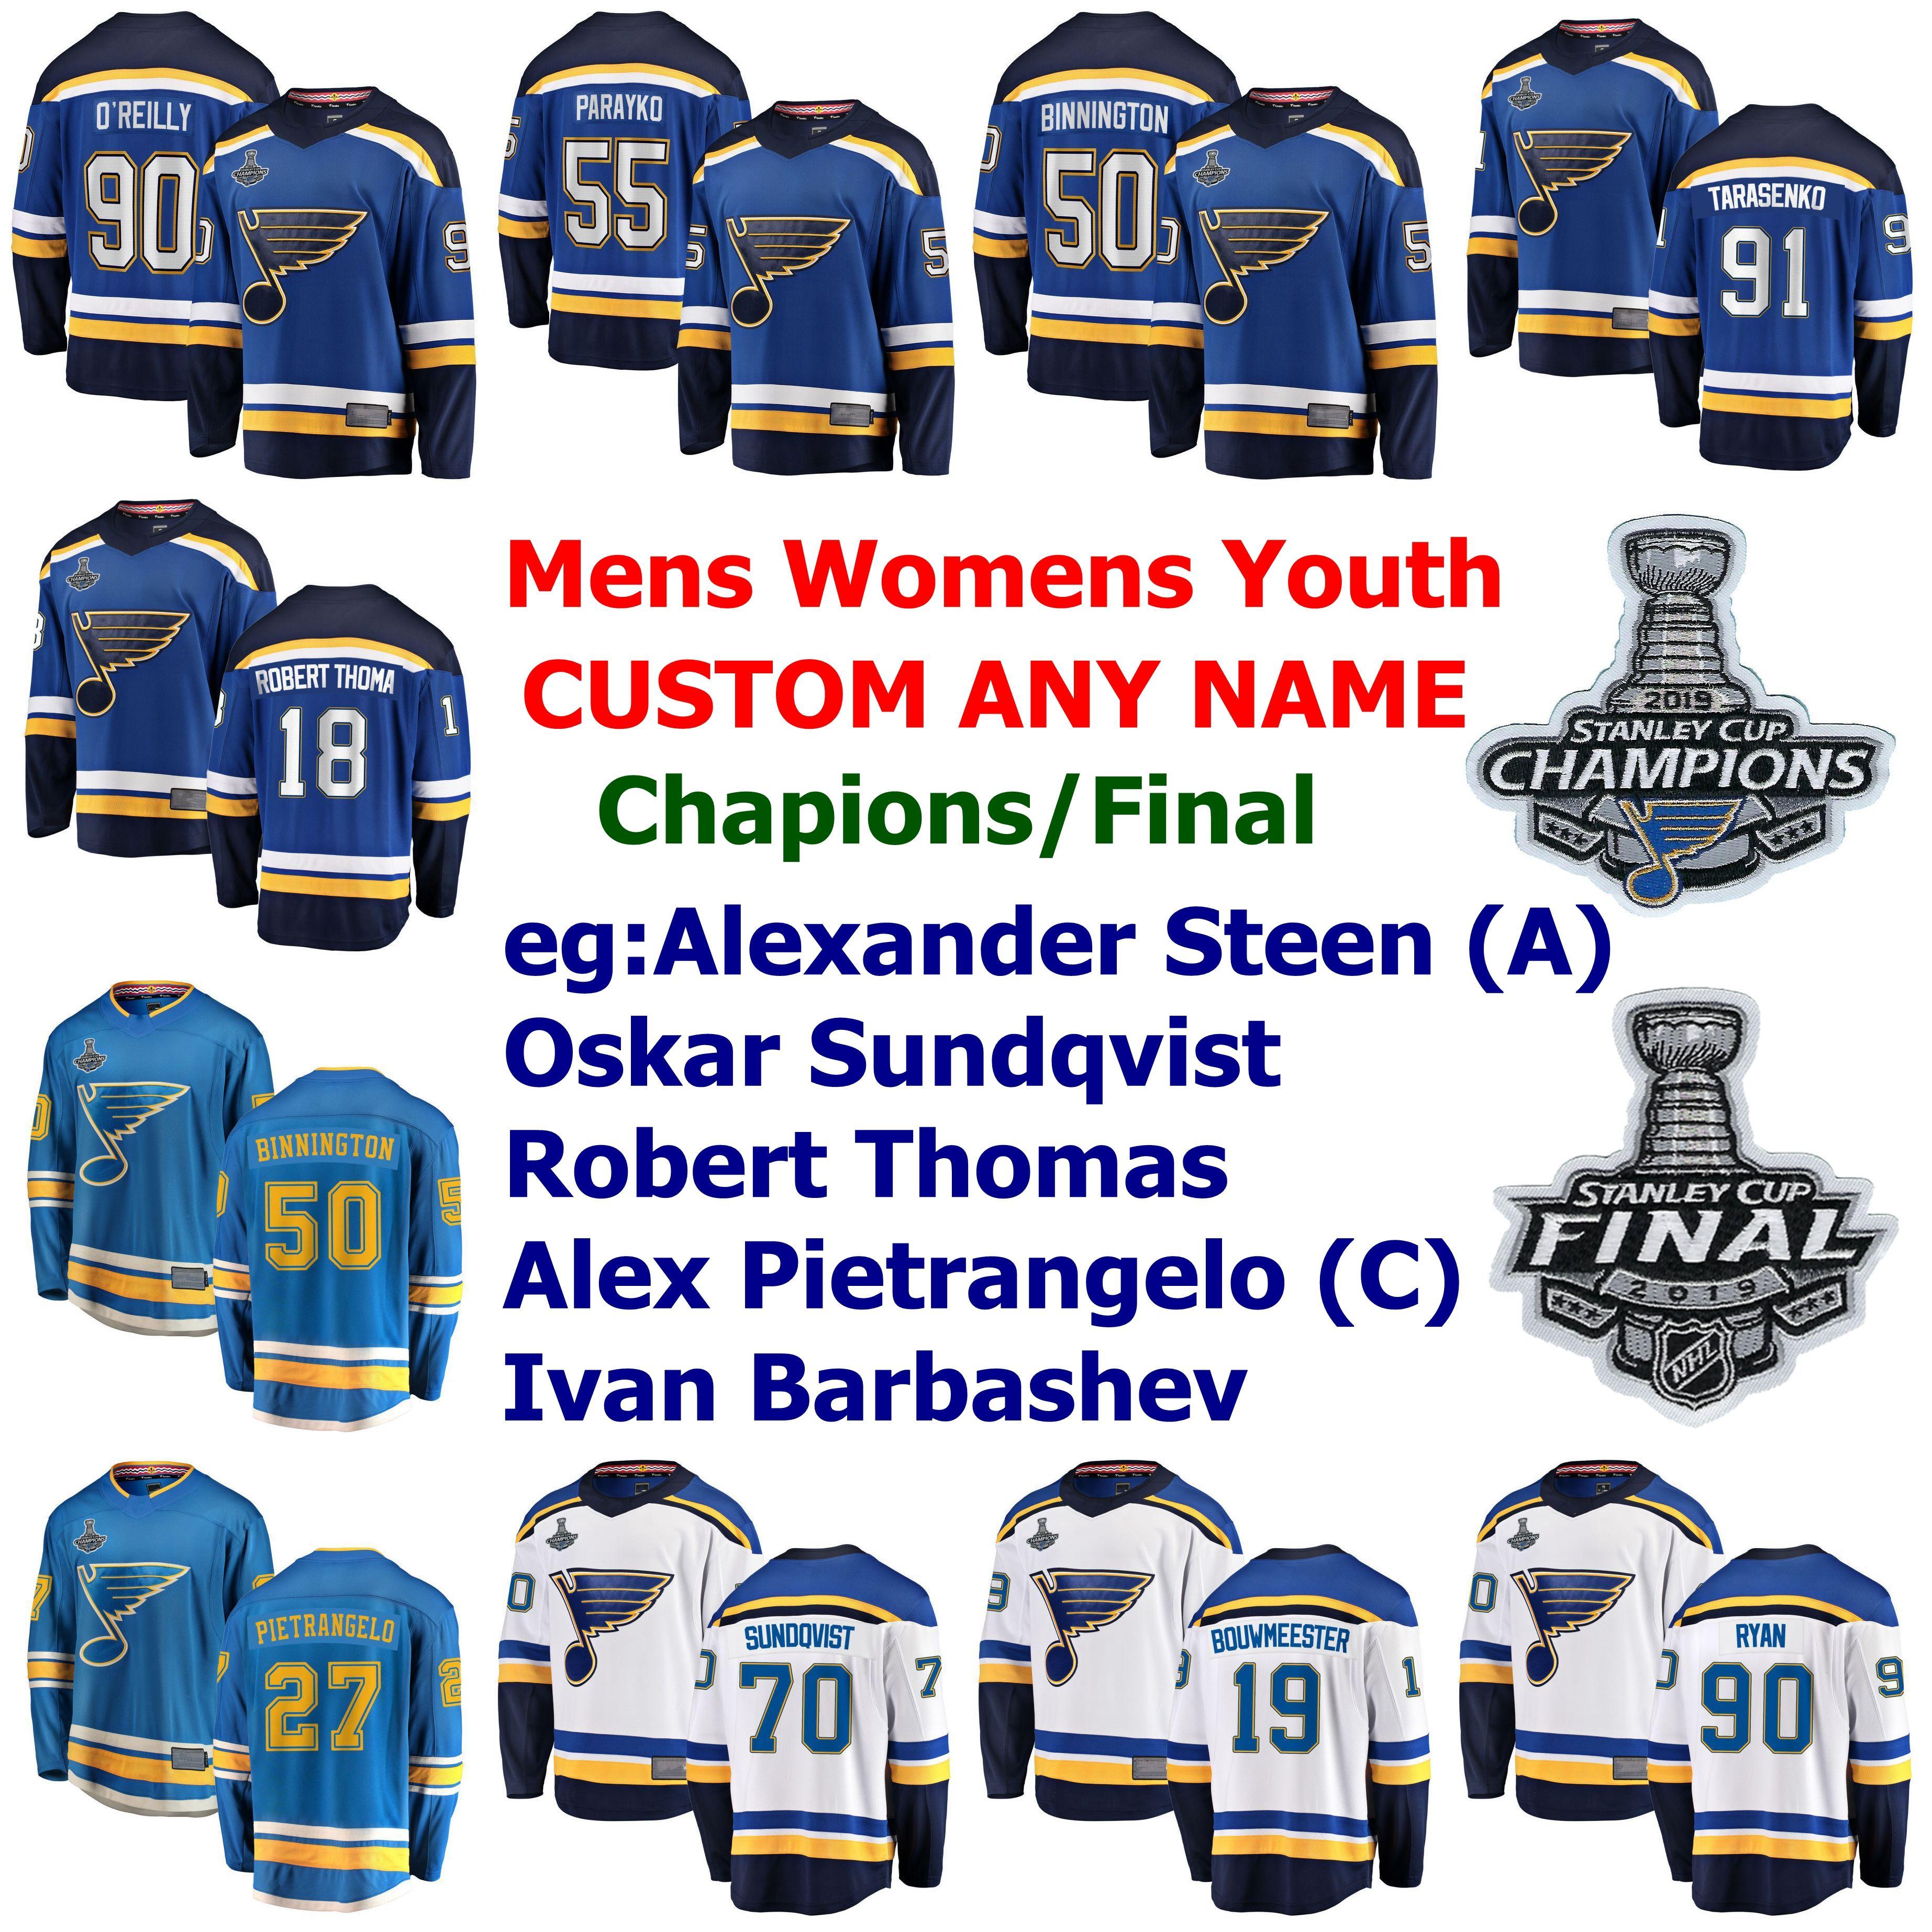 2019 Stanley Cup Şampiyonlar St Louis Blues Hokey Formalar Tarasenko Jersey Ryan O'Reilly Binnington Parayko Alex Pietrangelo Özel Dikişli